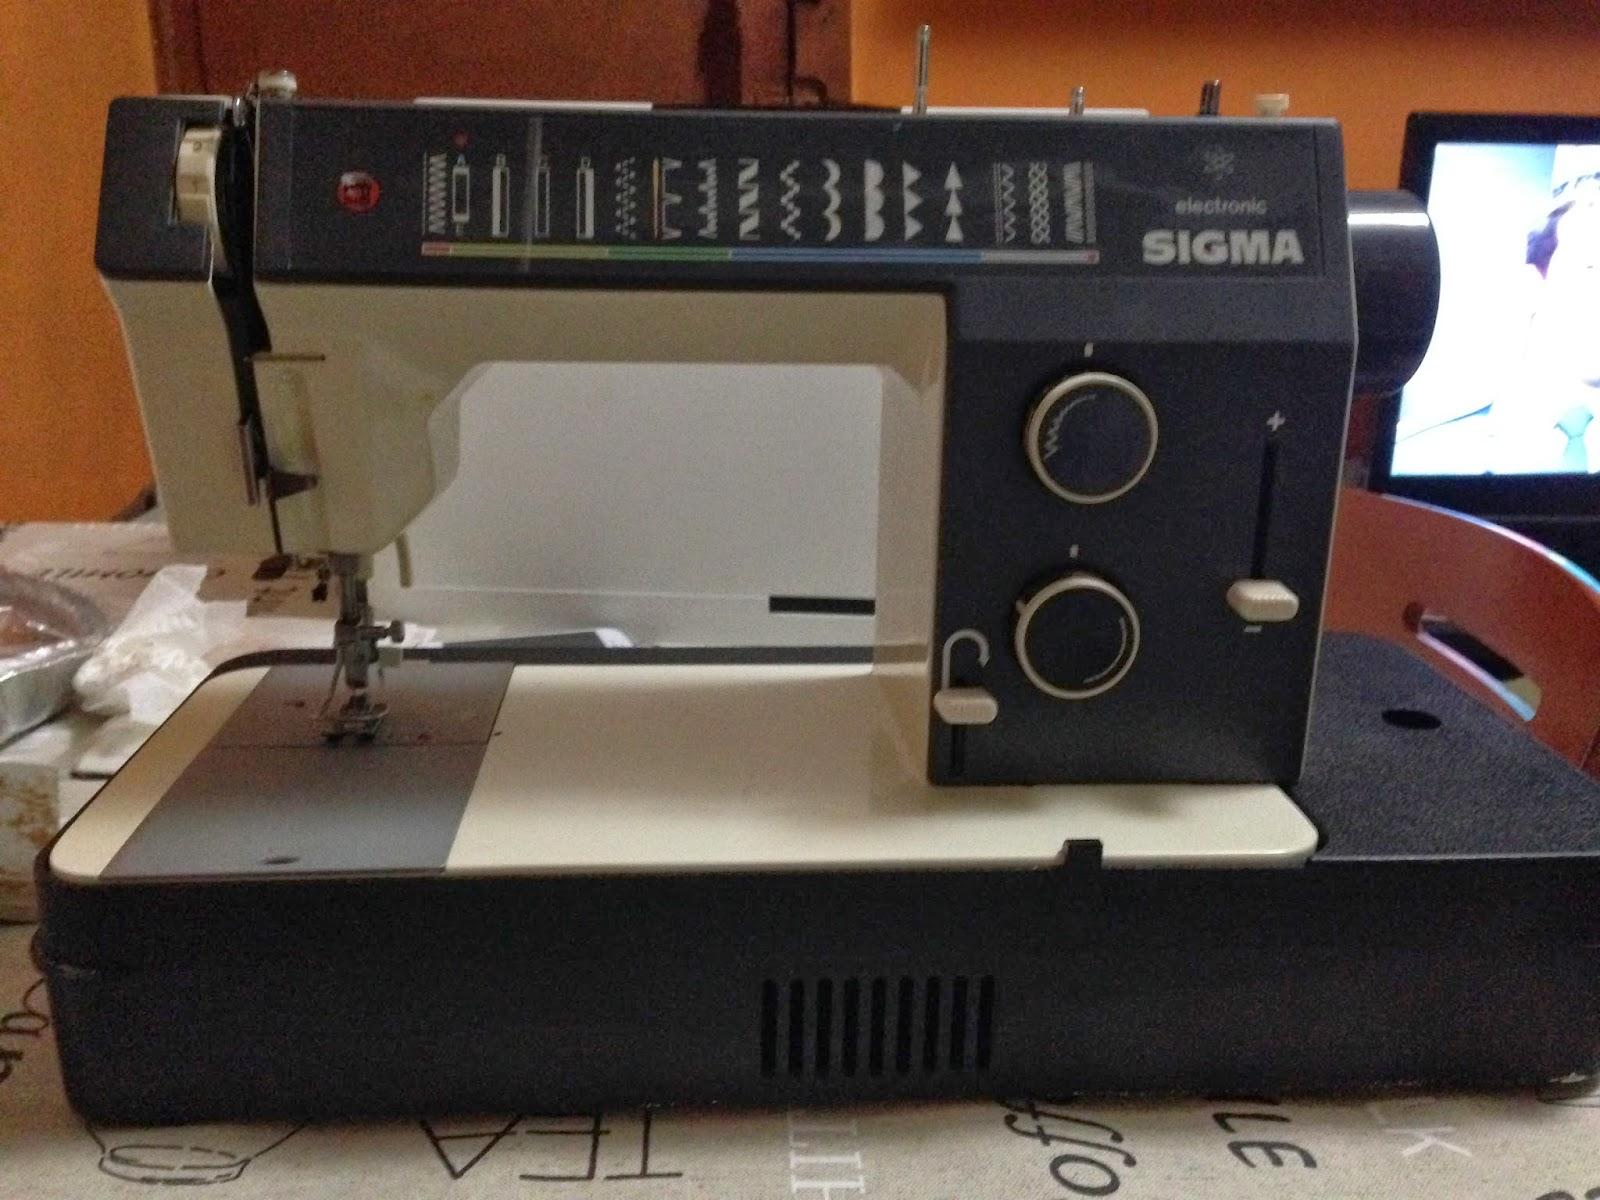 Mis Primeras Puntadas Os Presento Mi Máquina Sigma 2002